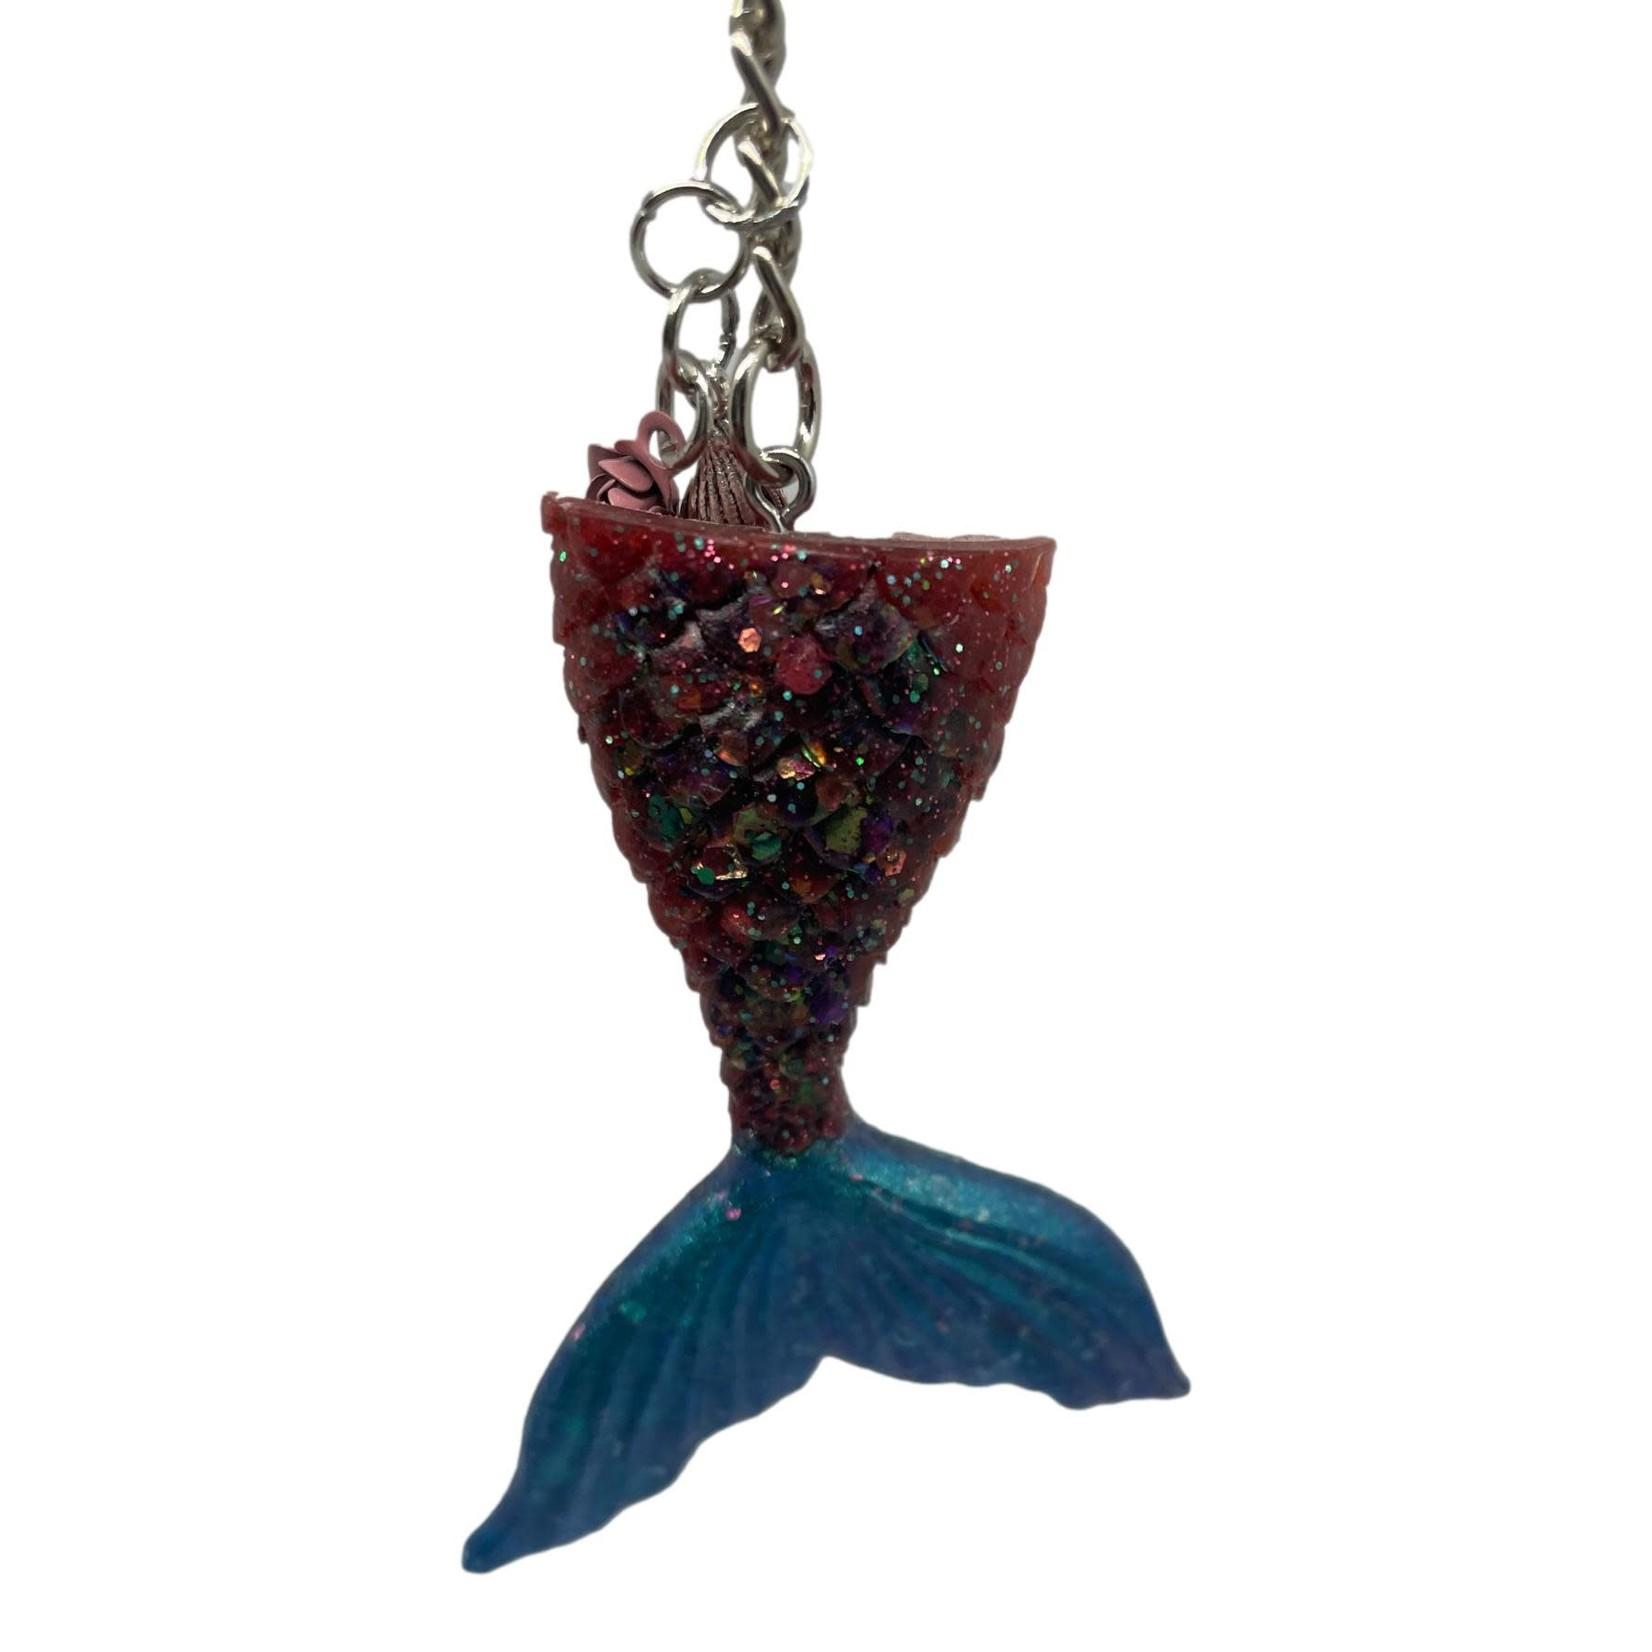 East Coast Sirens Two-tone Mermaid Tail Key Chain